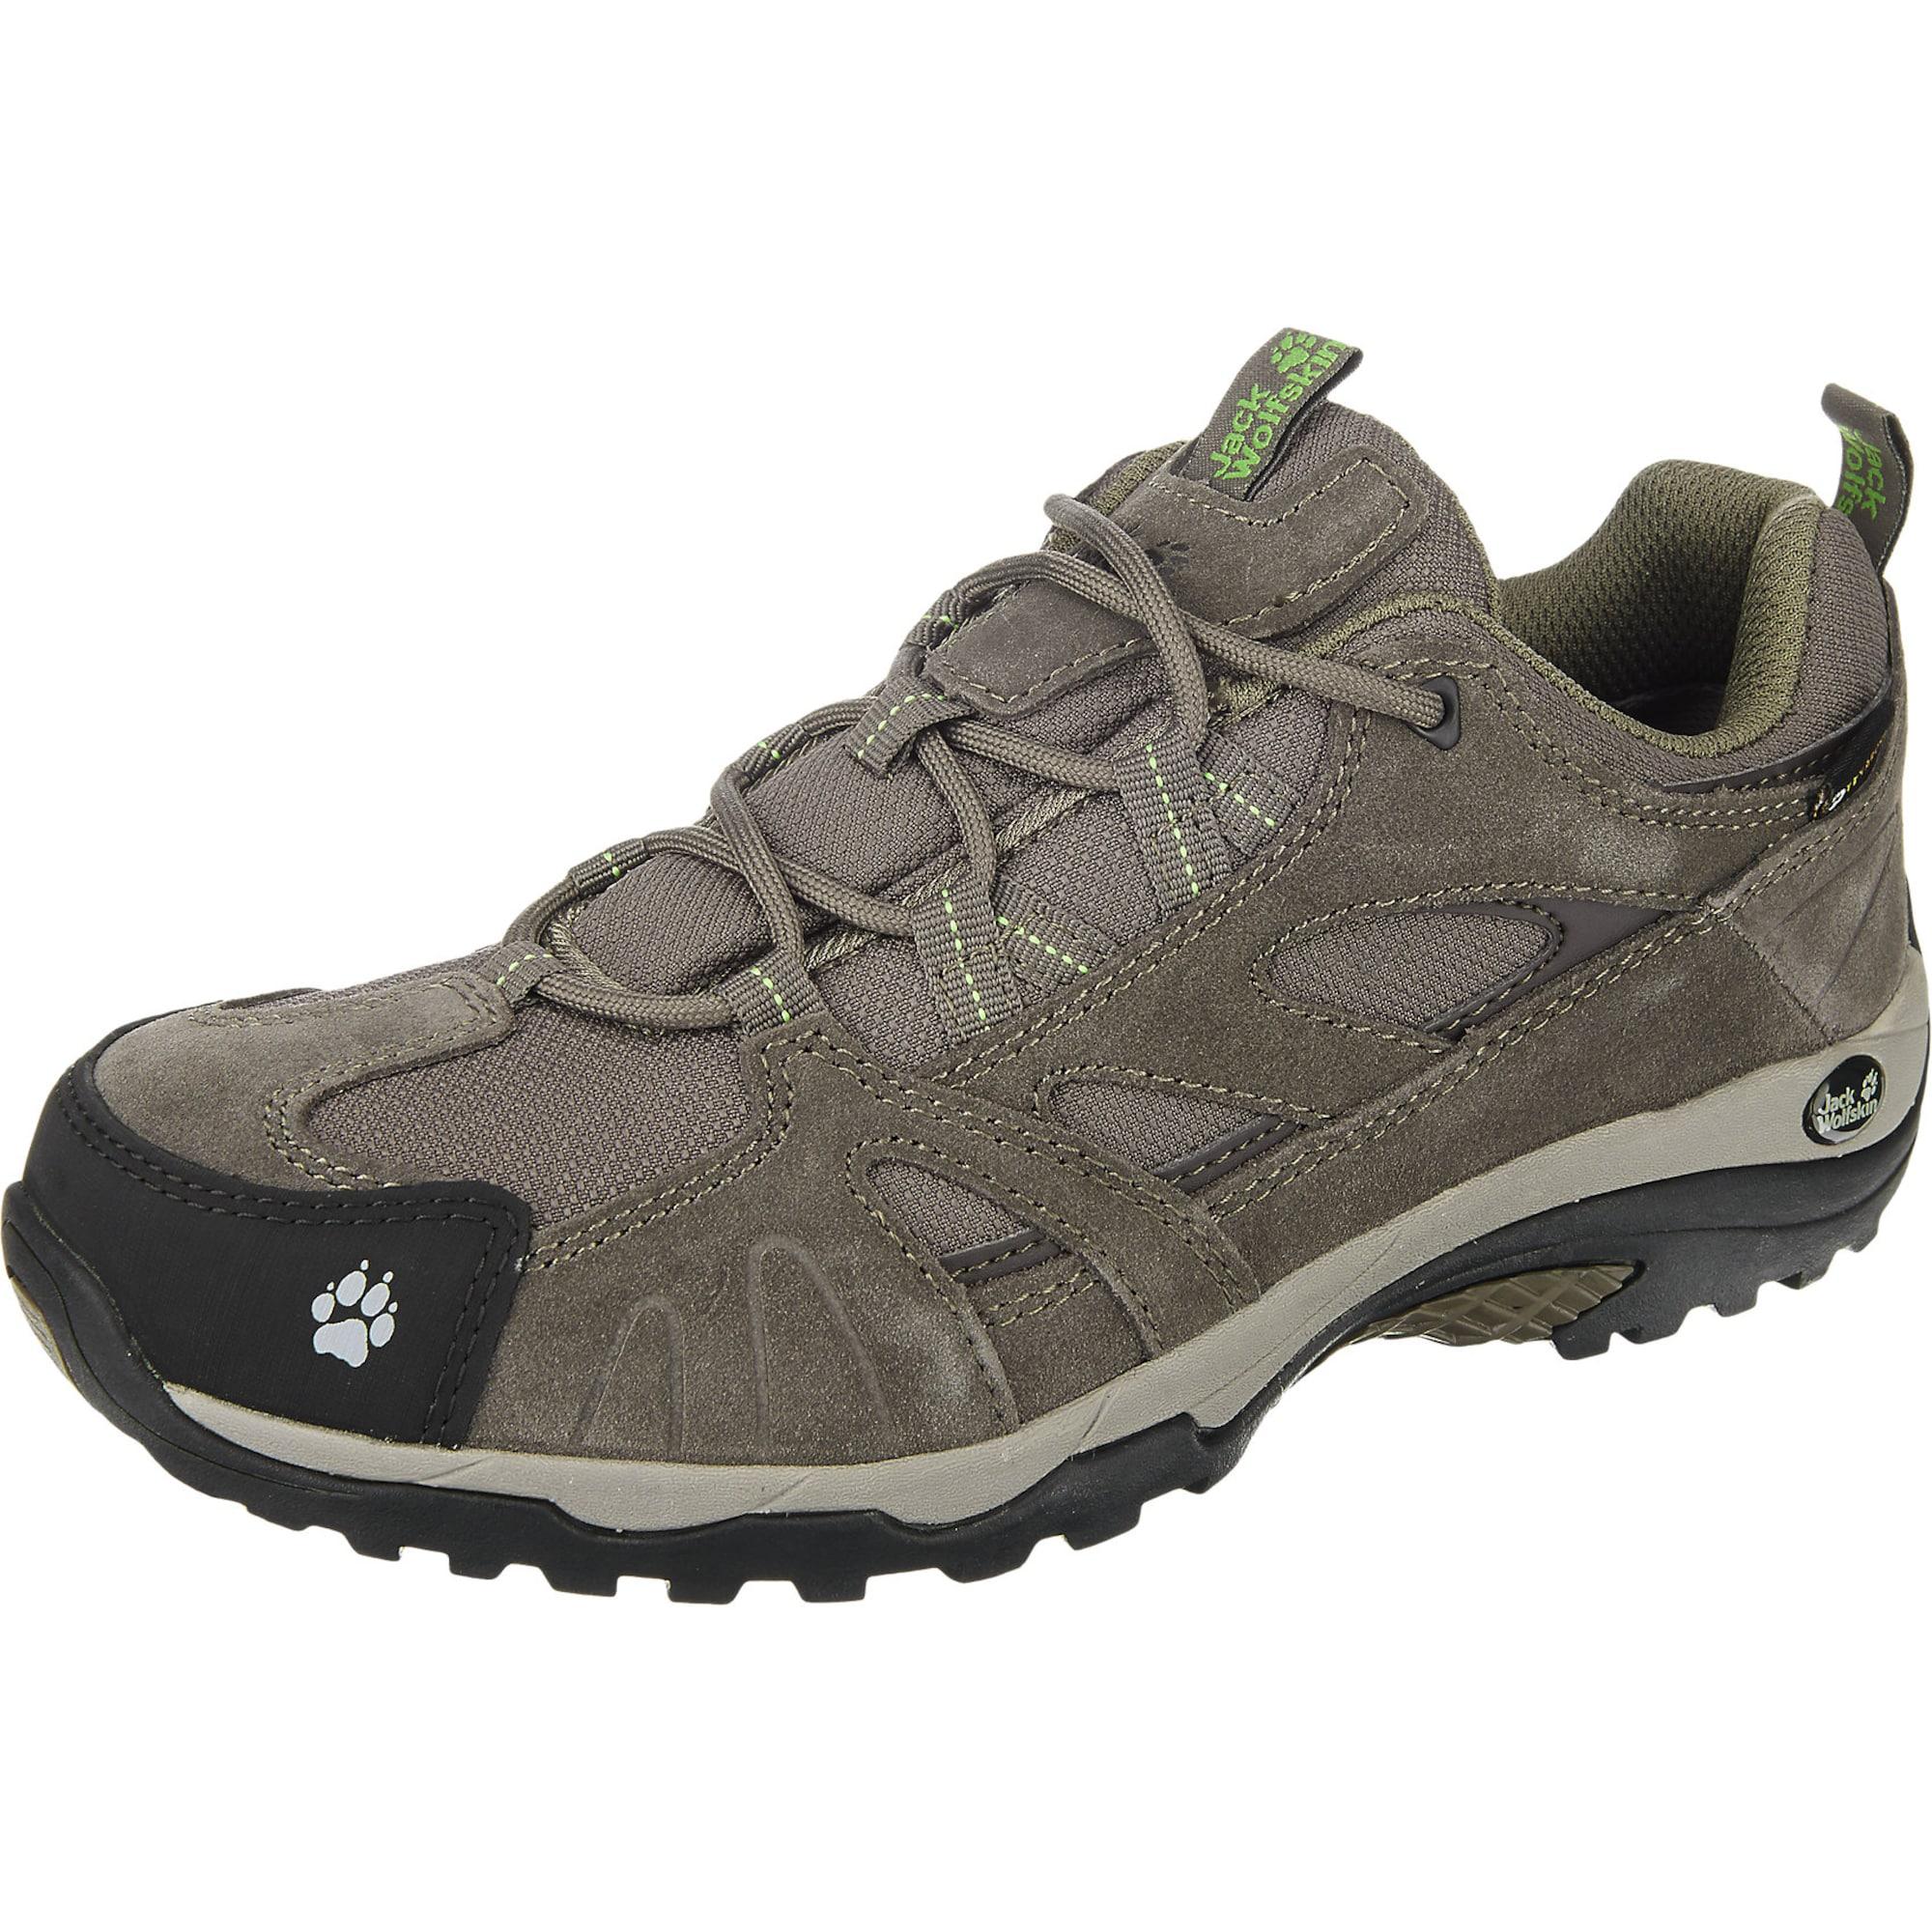 save off a9060 dfc2c Jack Wolfskin Schuhe für aktive Damen - ModeExpertise